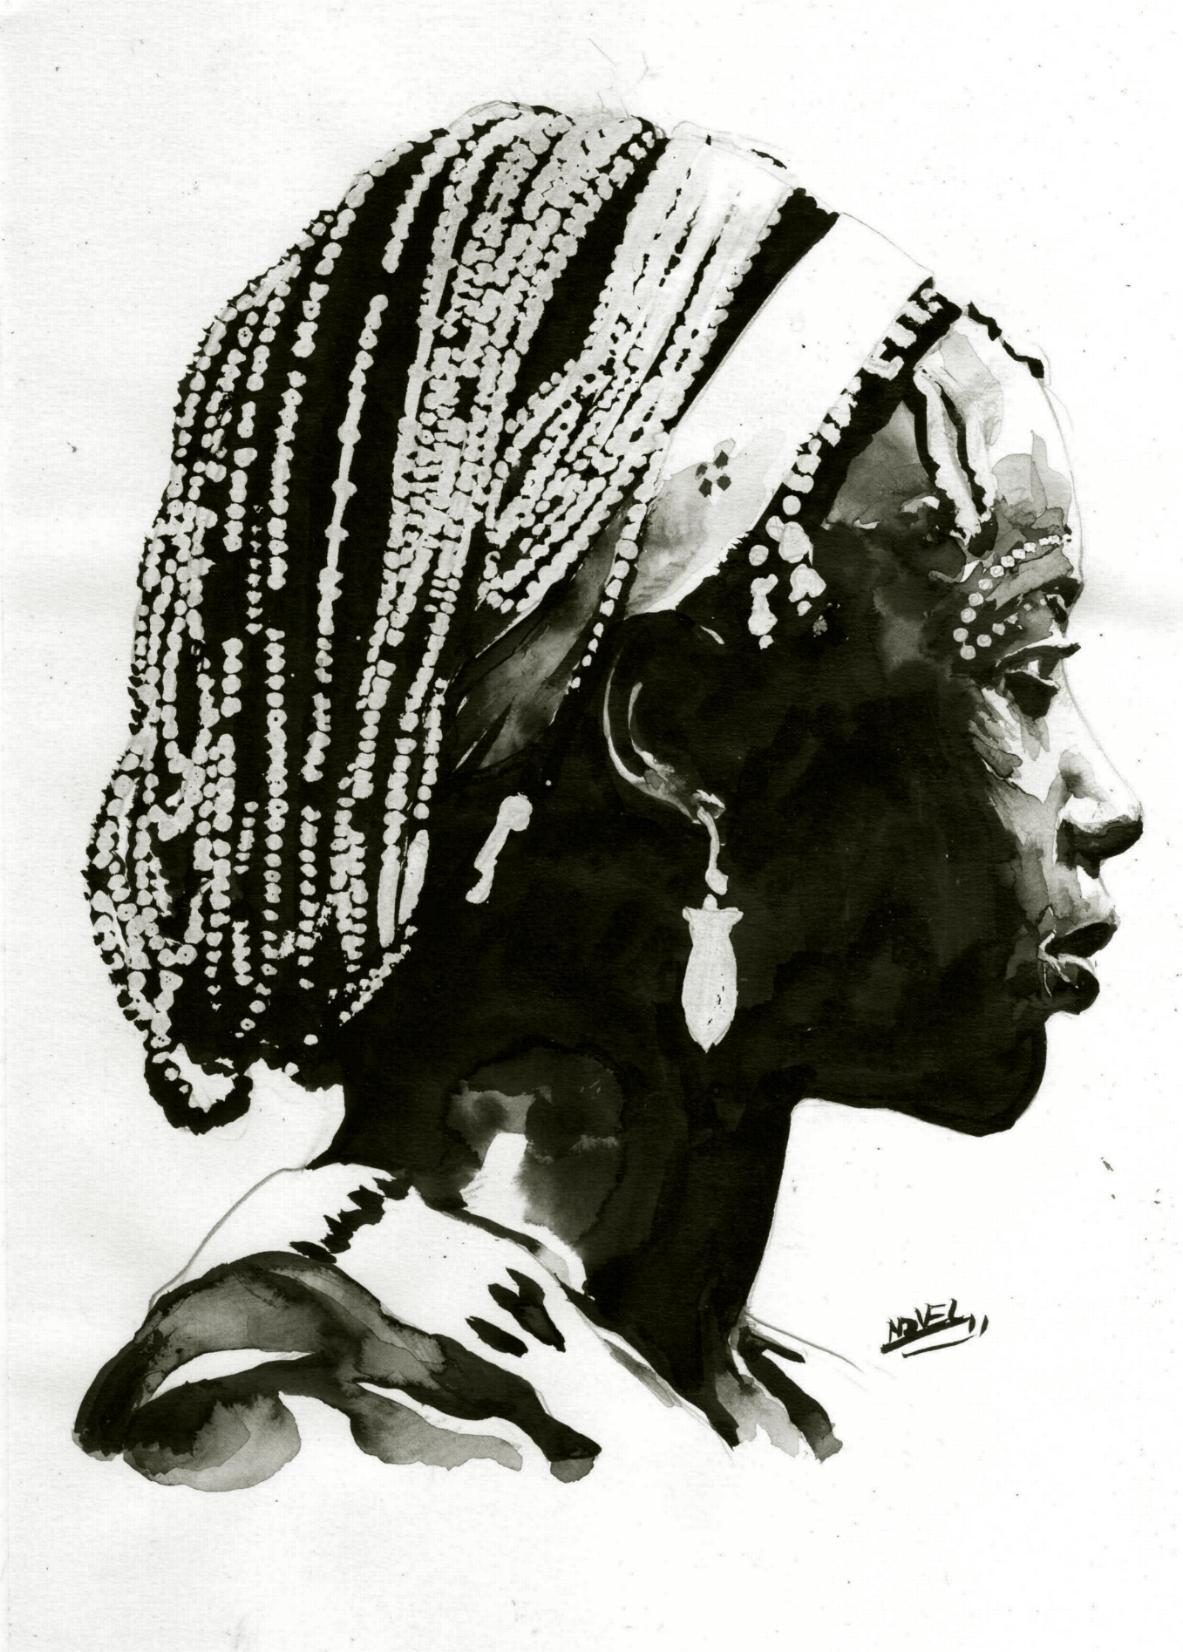 C novel dessins peuples d afrique 3 - Dessin africaine ...